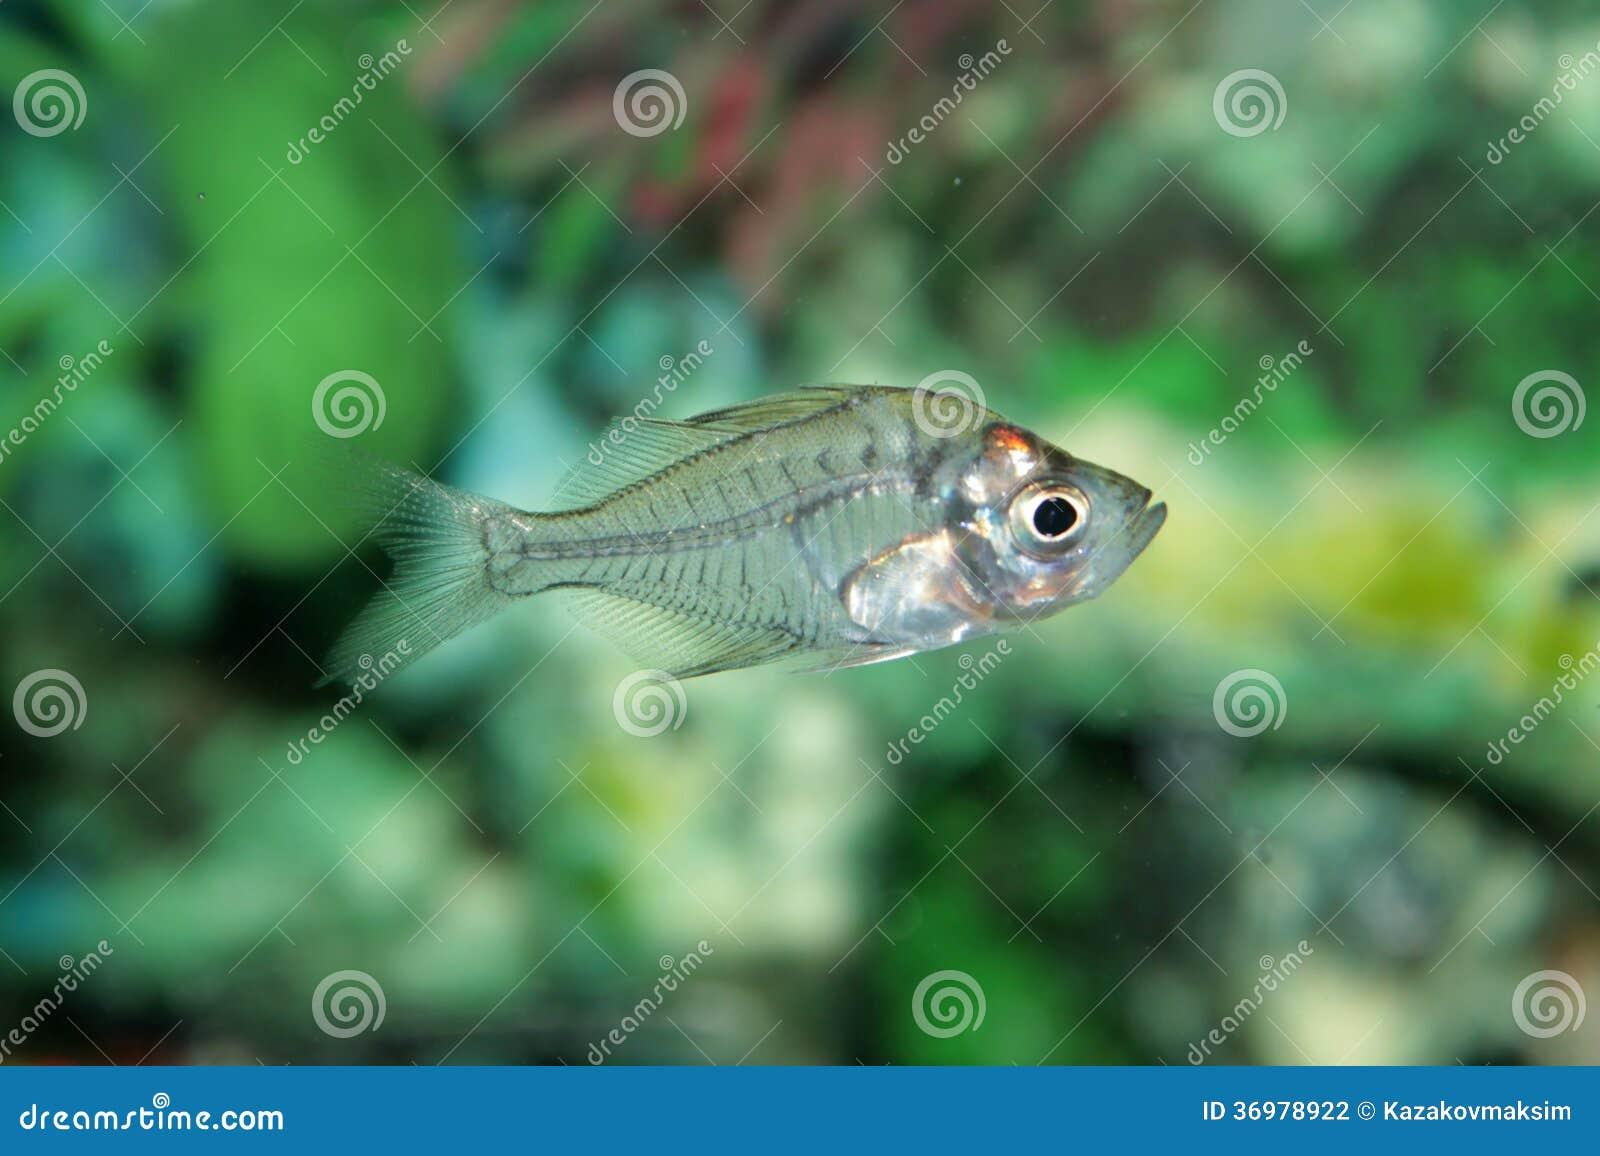 Indian Glass Perch Aquarium Fish Stock Photo Image Of Glassy